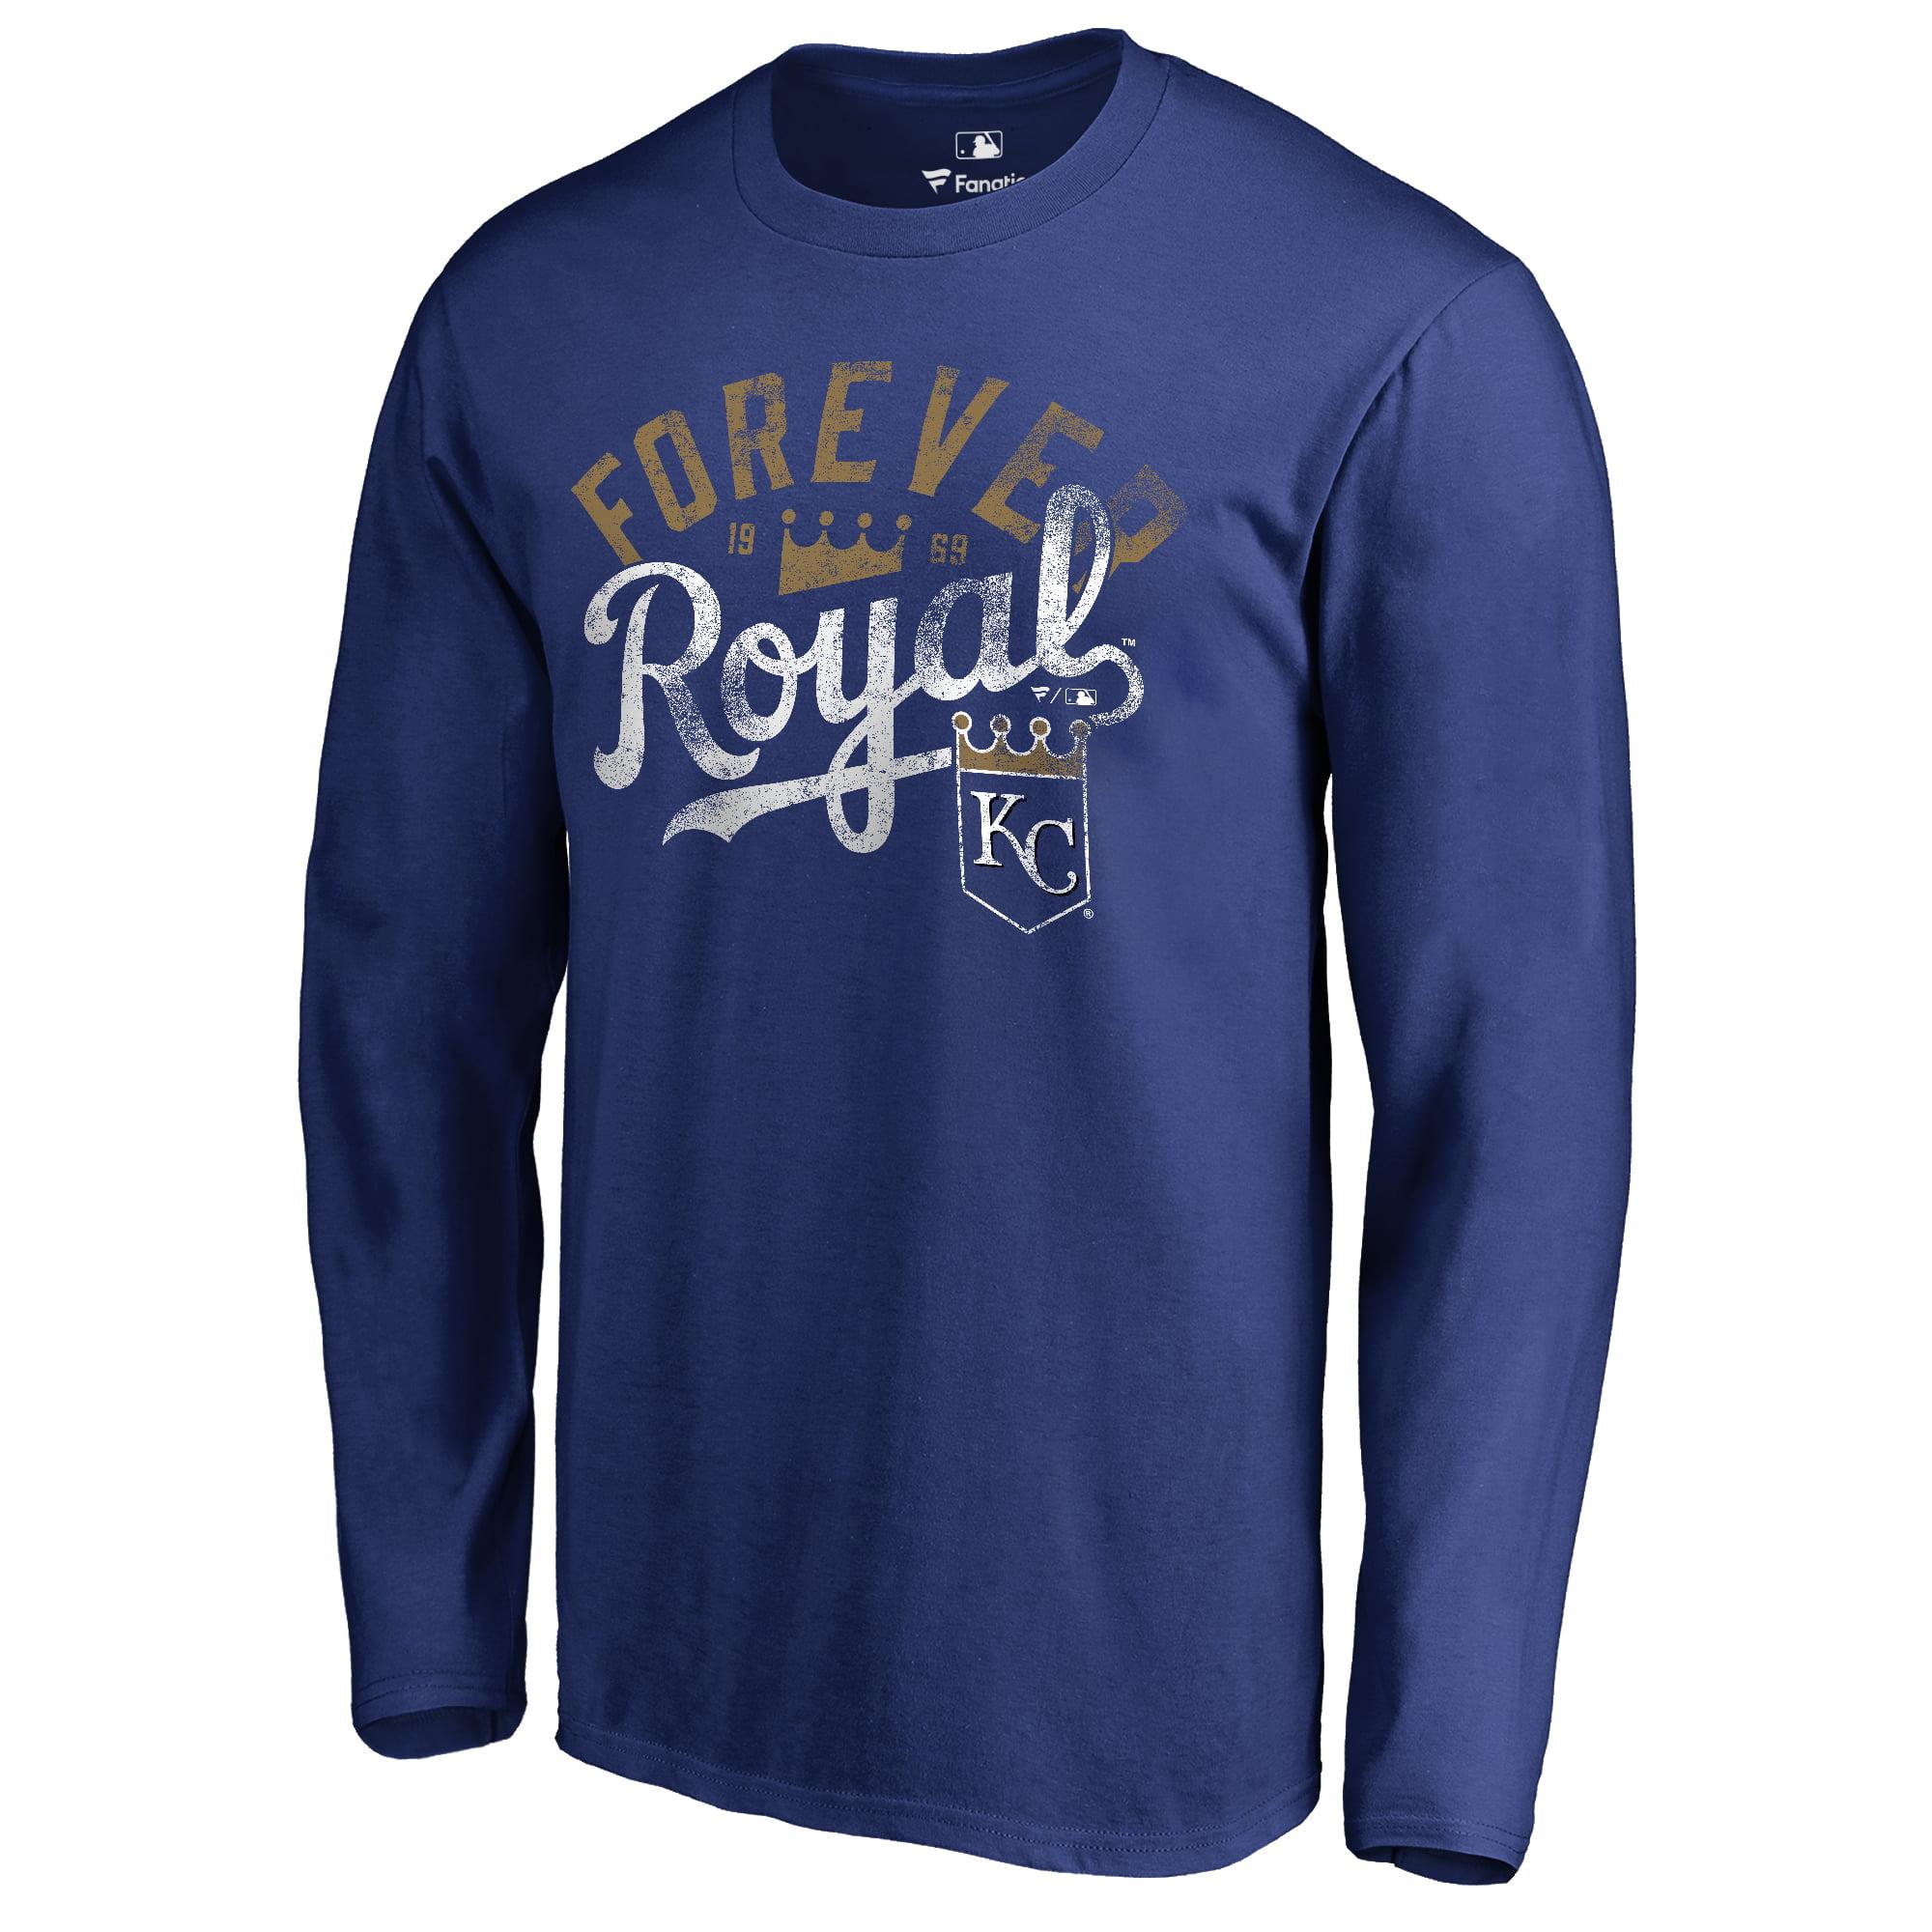 Kansas City Royals Hometown Collection Forever Royal Long Sleeve T-Shirt - Royal